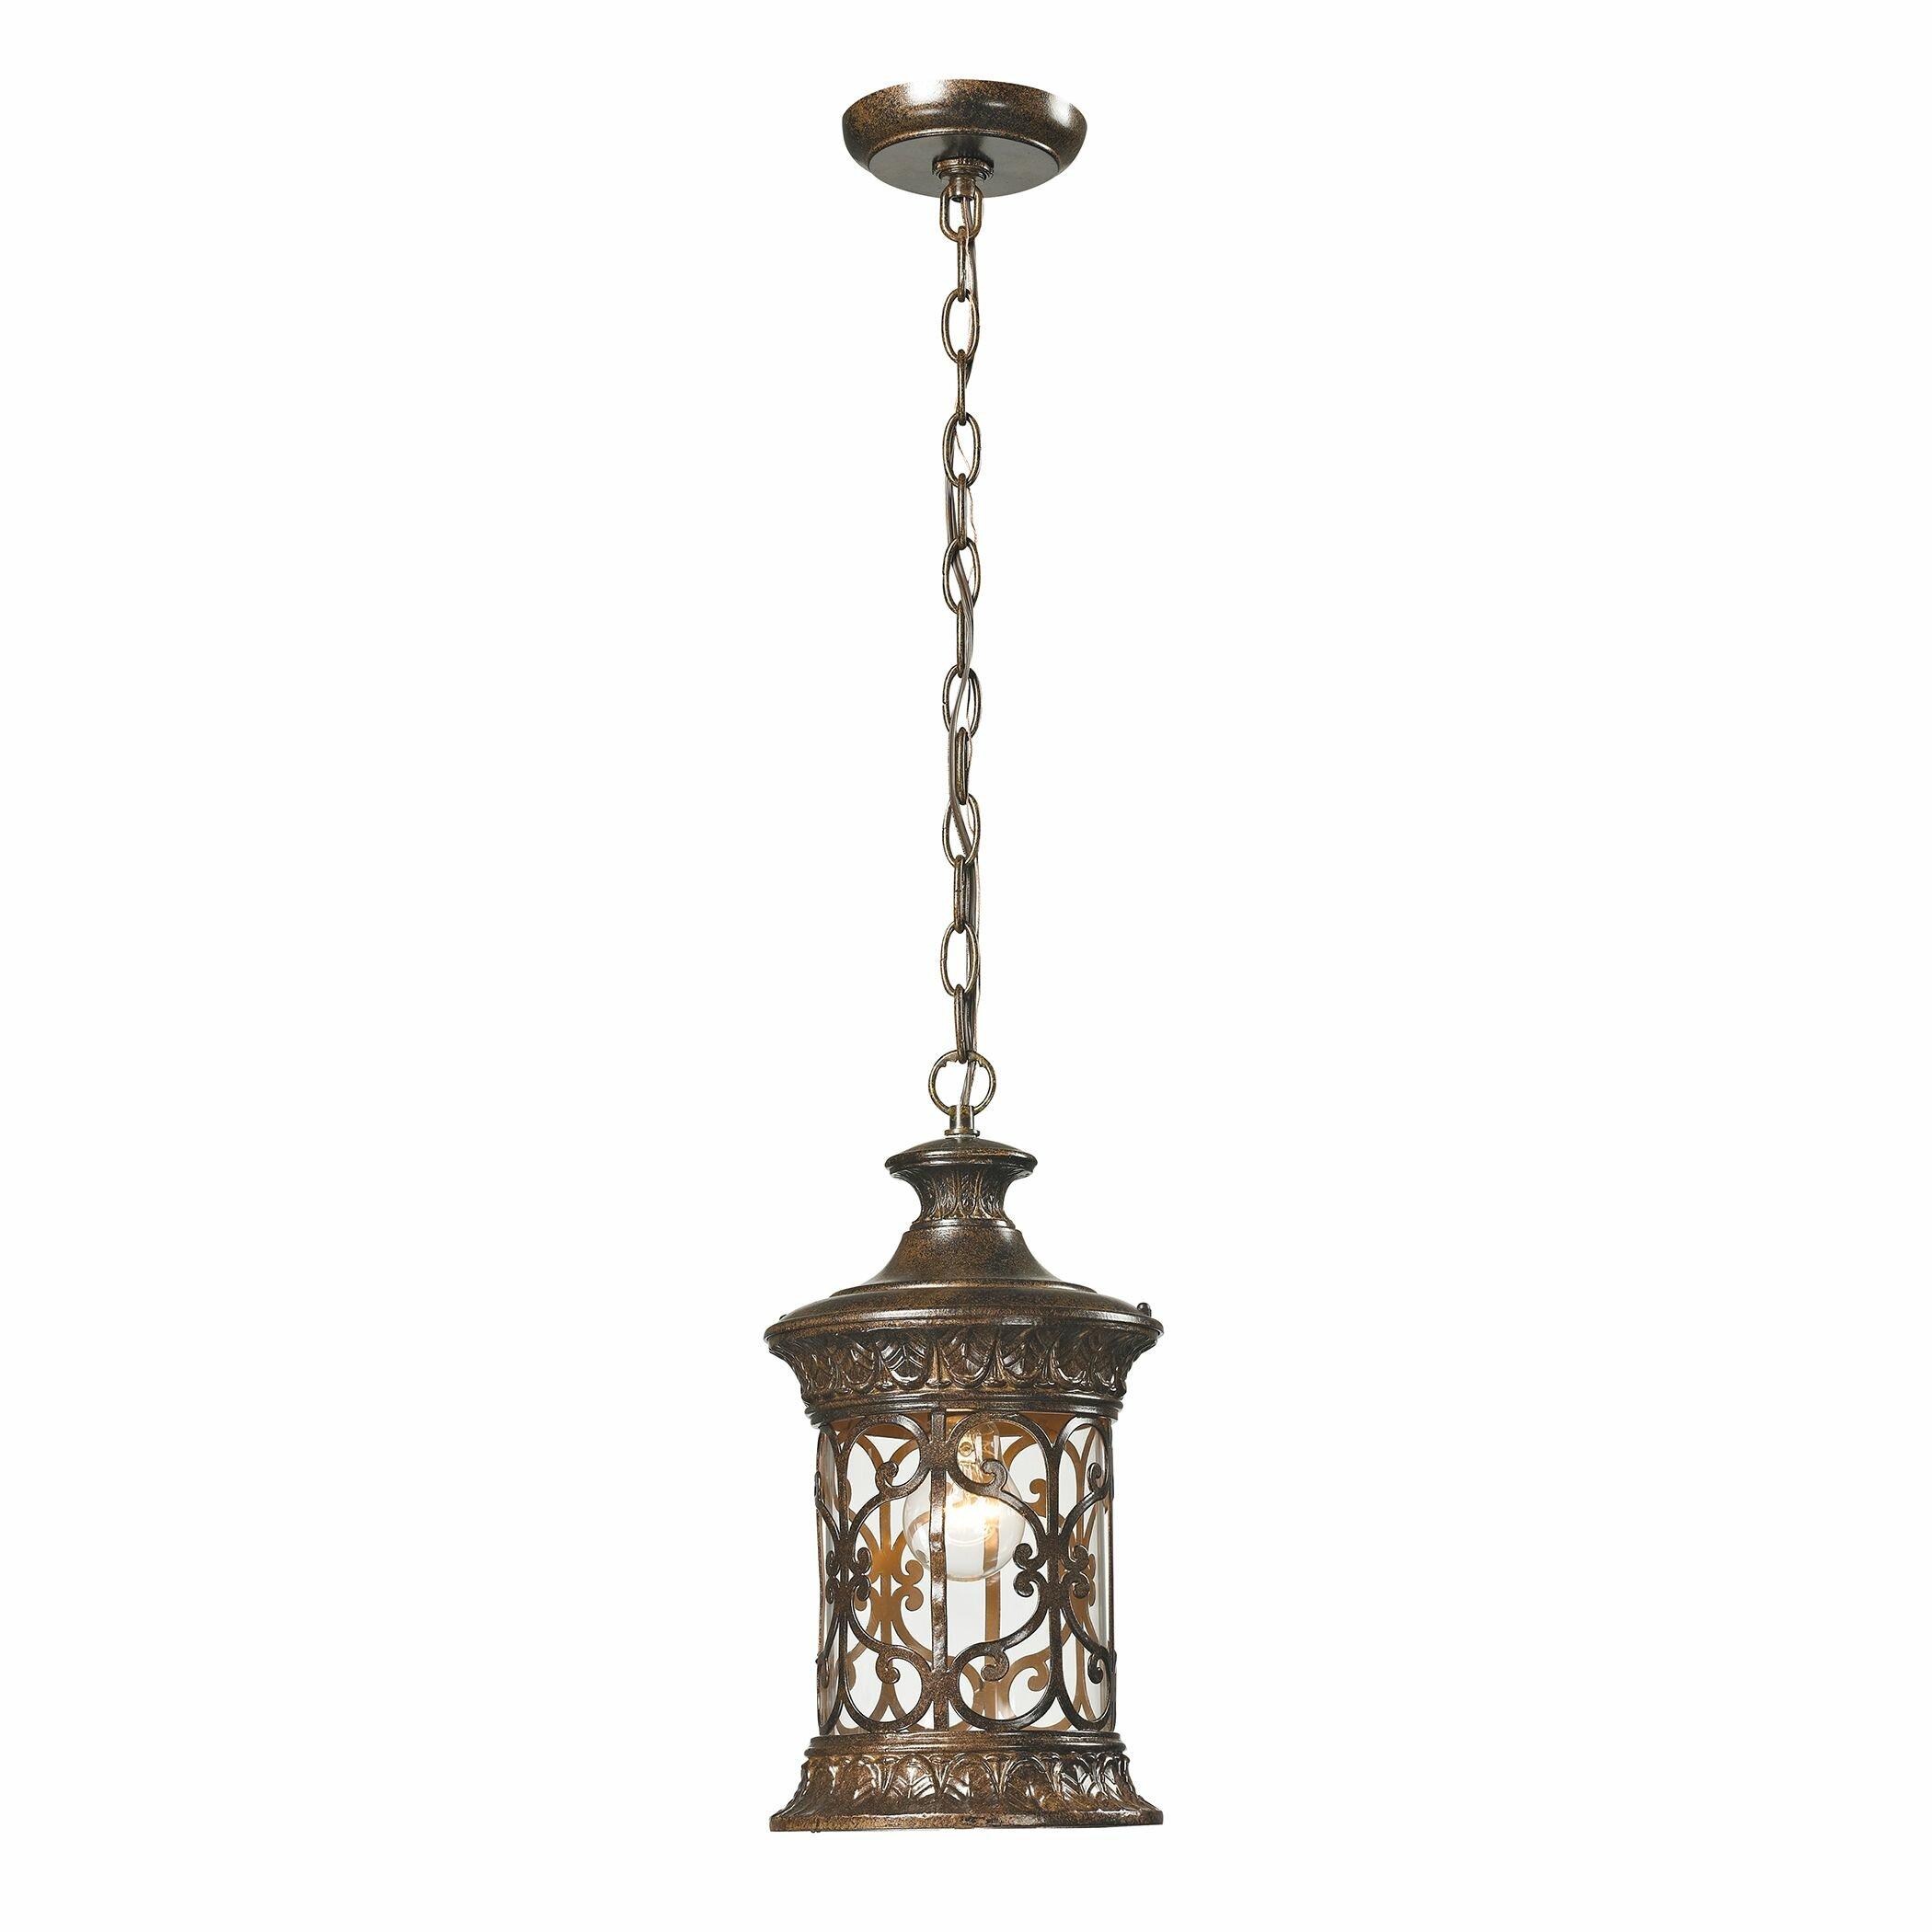 elk lighting orlean 1 light outdoor pendant reviews